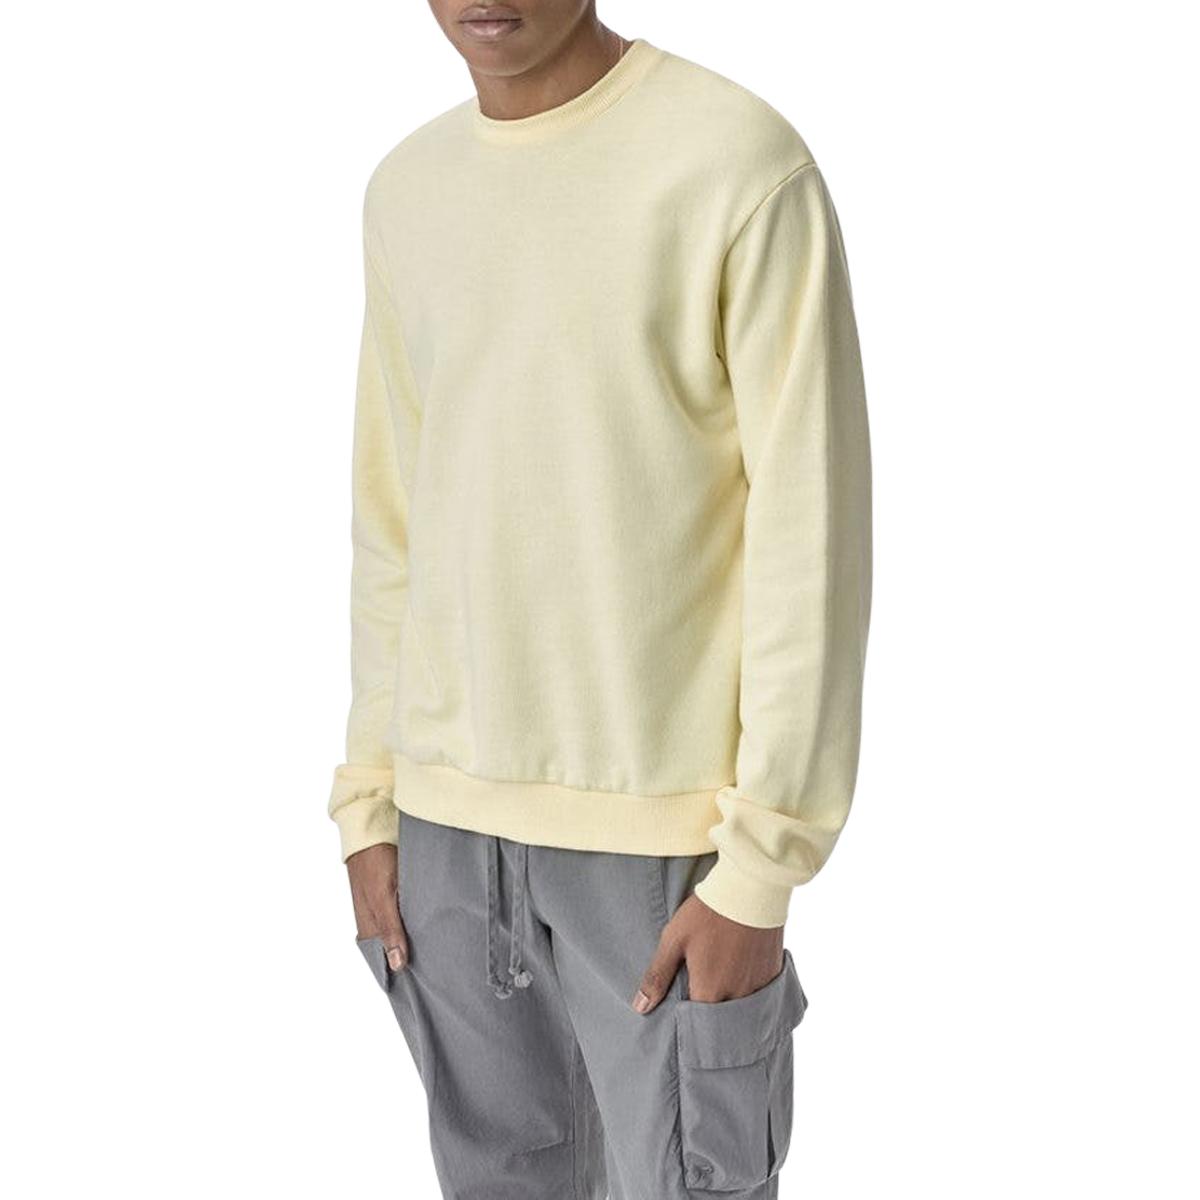 John Elliott Oversized Crewneck Pullover